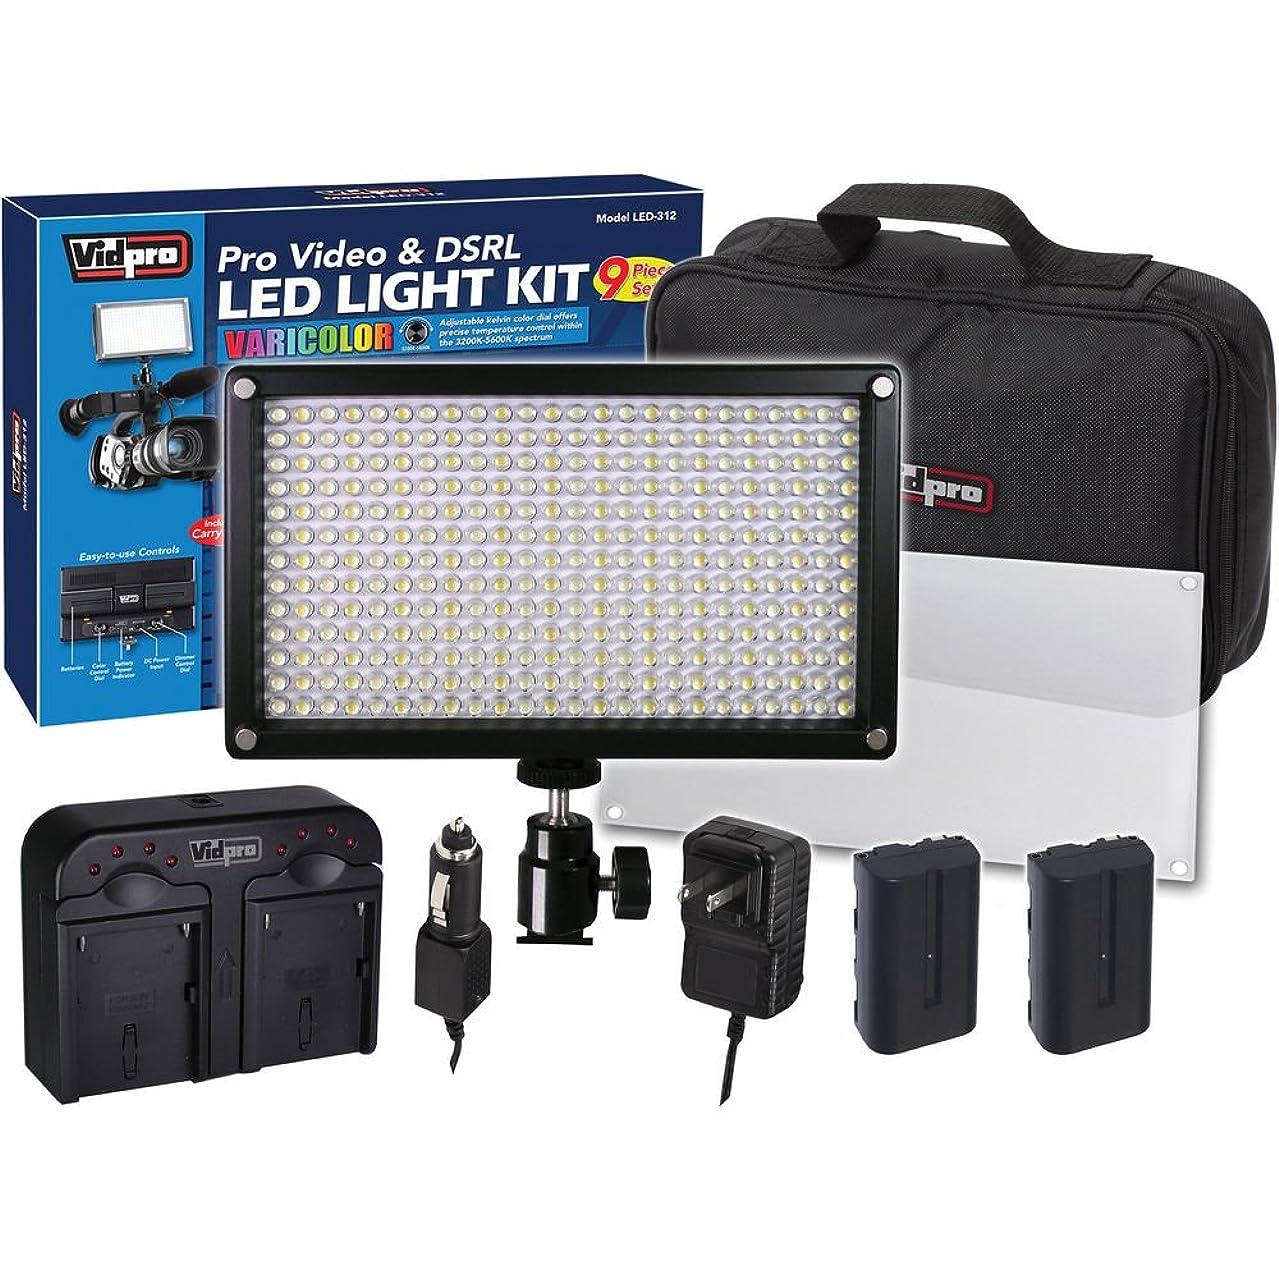 Kodak Z650 Digital Camera Lighting Vidpro Varicolor 312-Bulb Video and Photo LED Light Kit